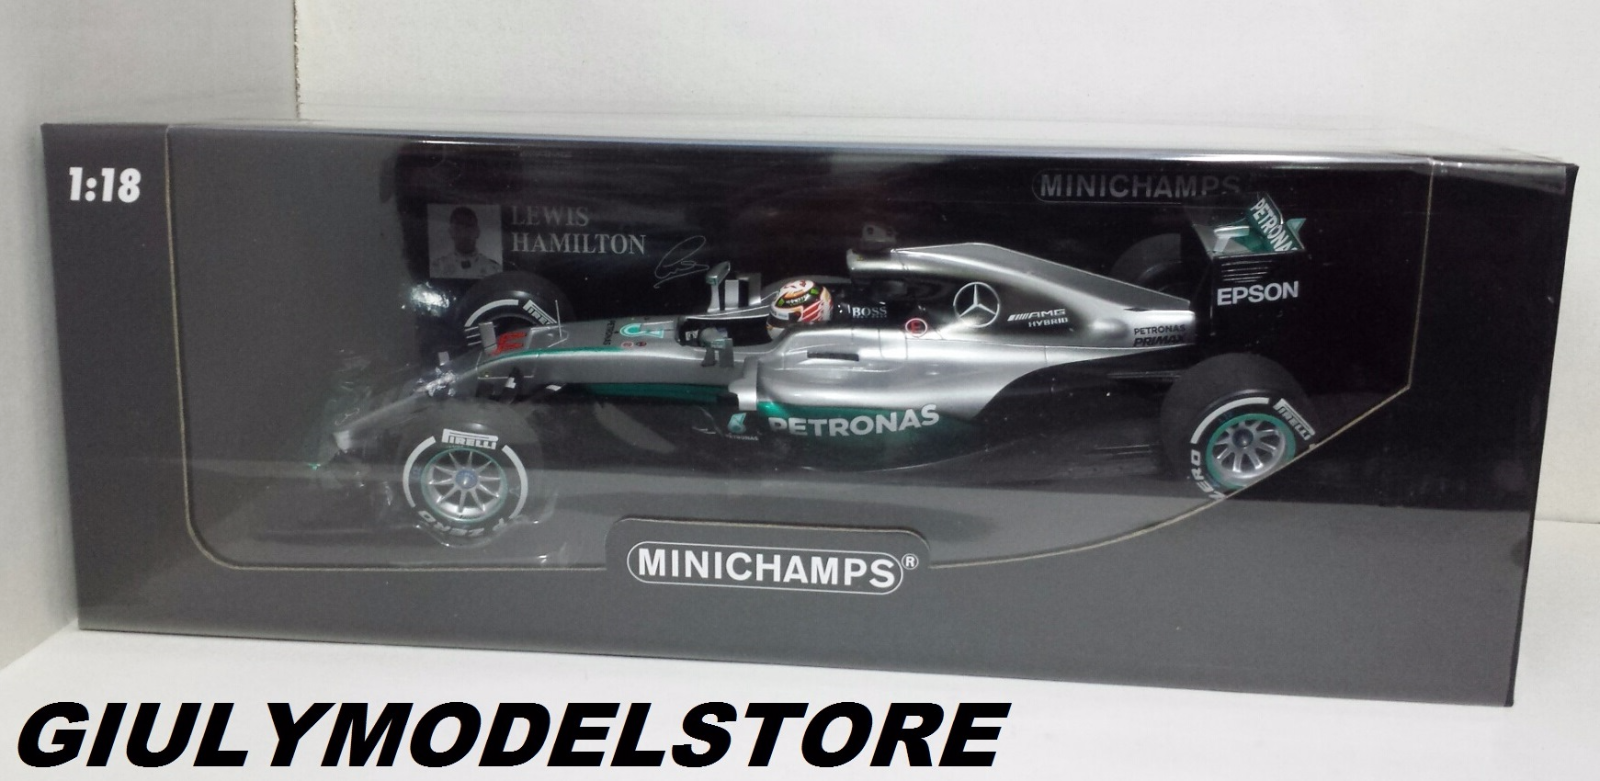 MINICHAMPS LEWIS HAMILTON 1/18 MERCEDES F1 W07 GP AUSTRALIA 2016 NEW